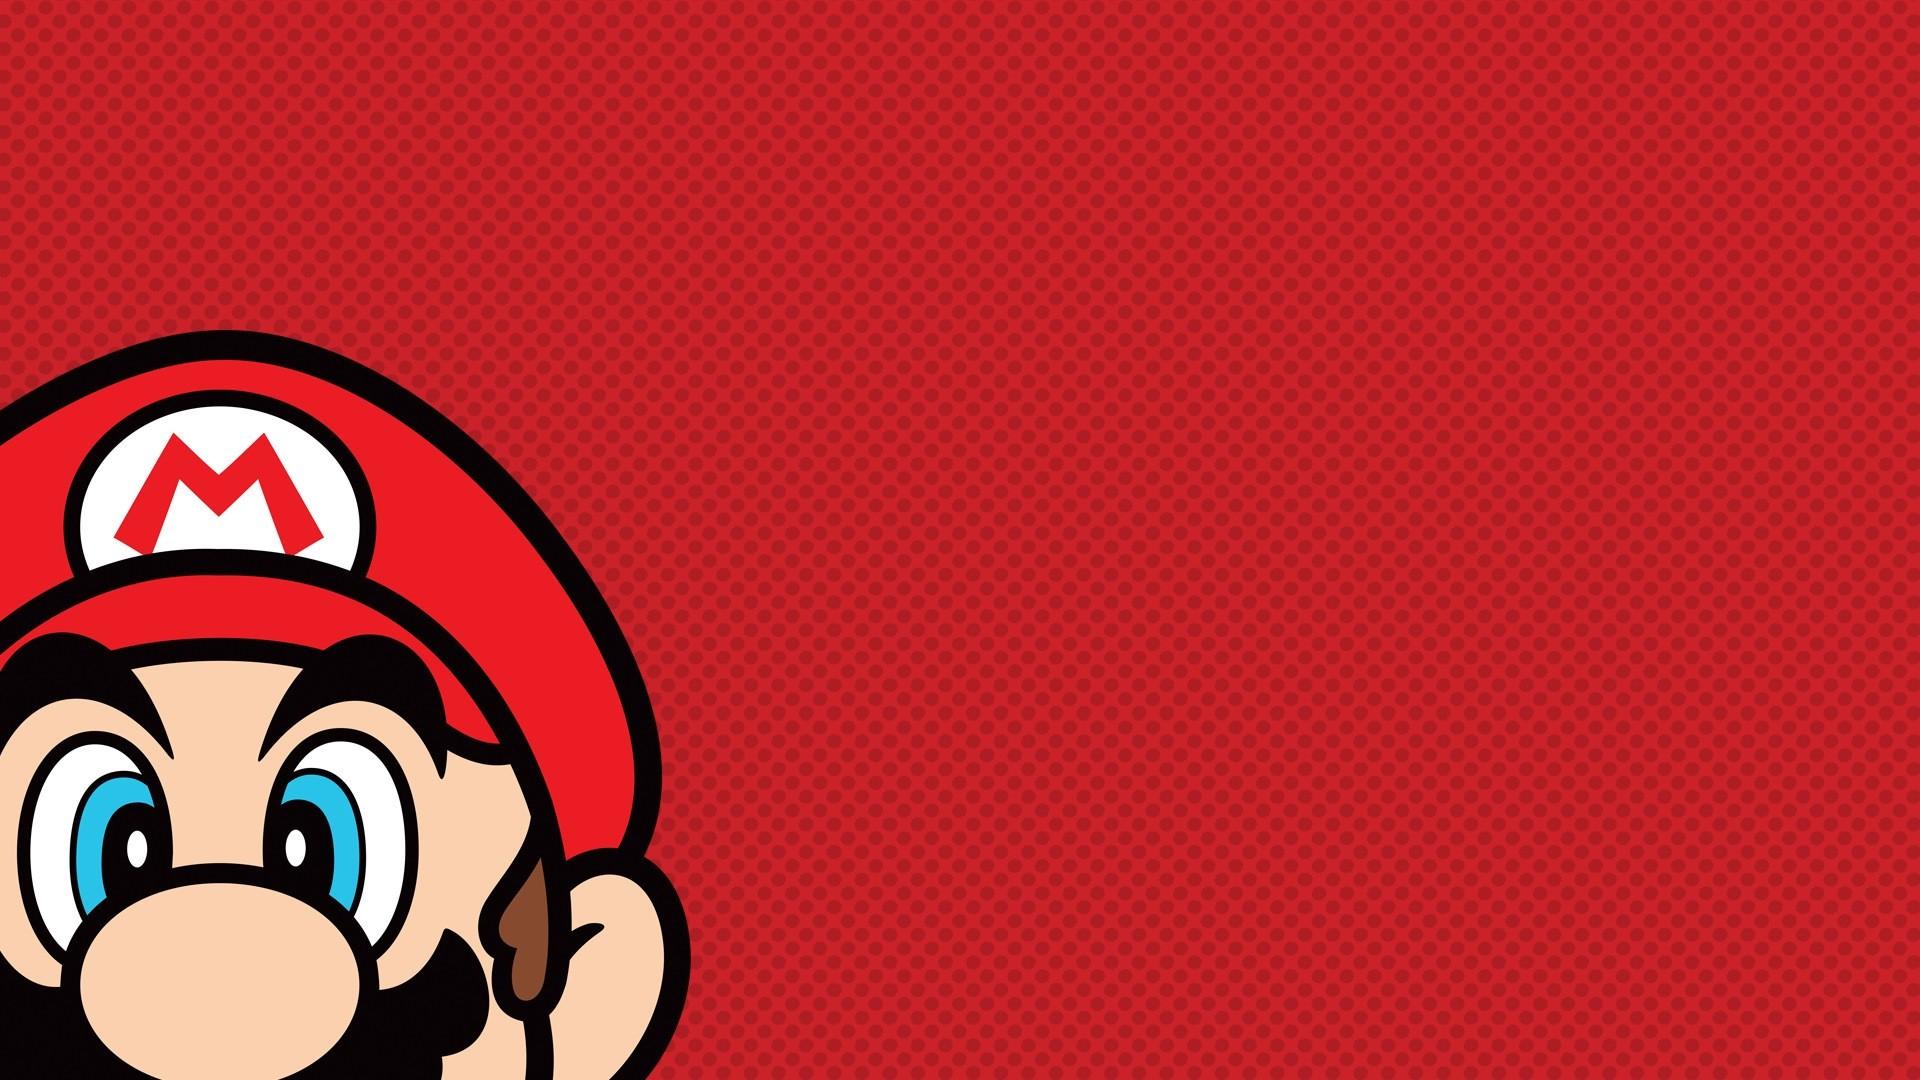 Nintendo Background Wallpaper